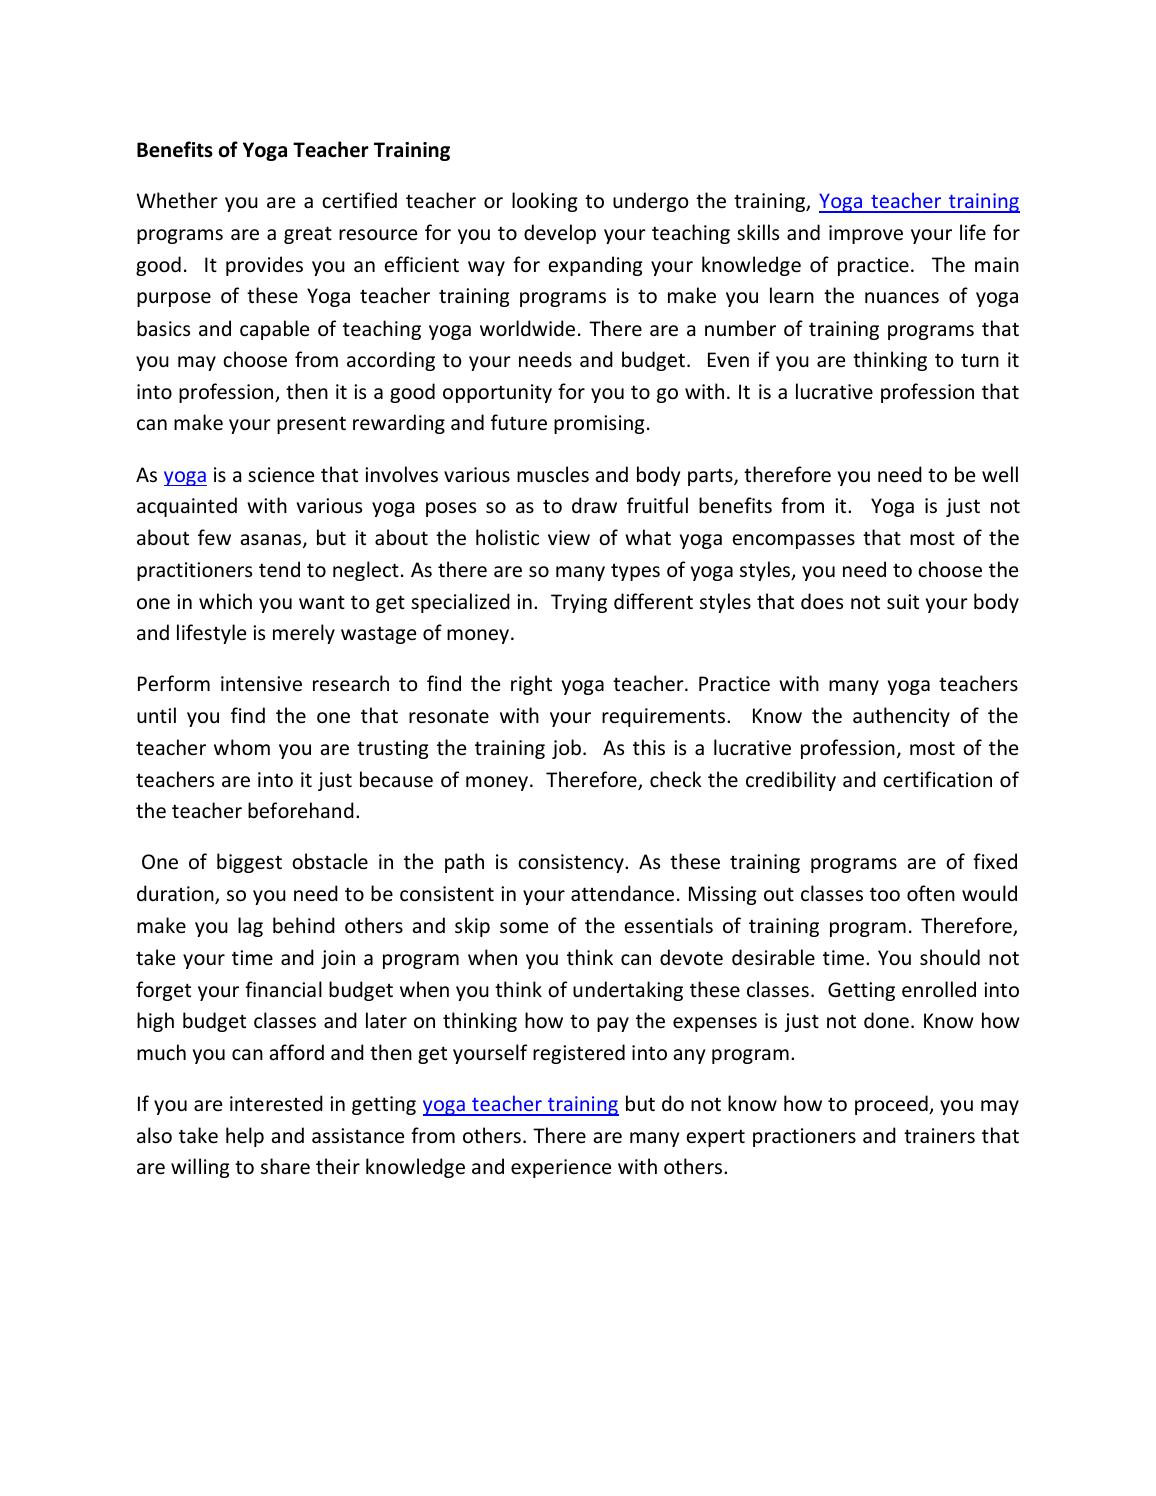 Benefits of yoga teacher training by robert smith - issuu